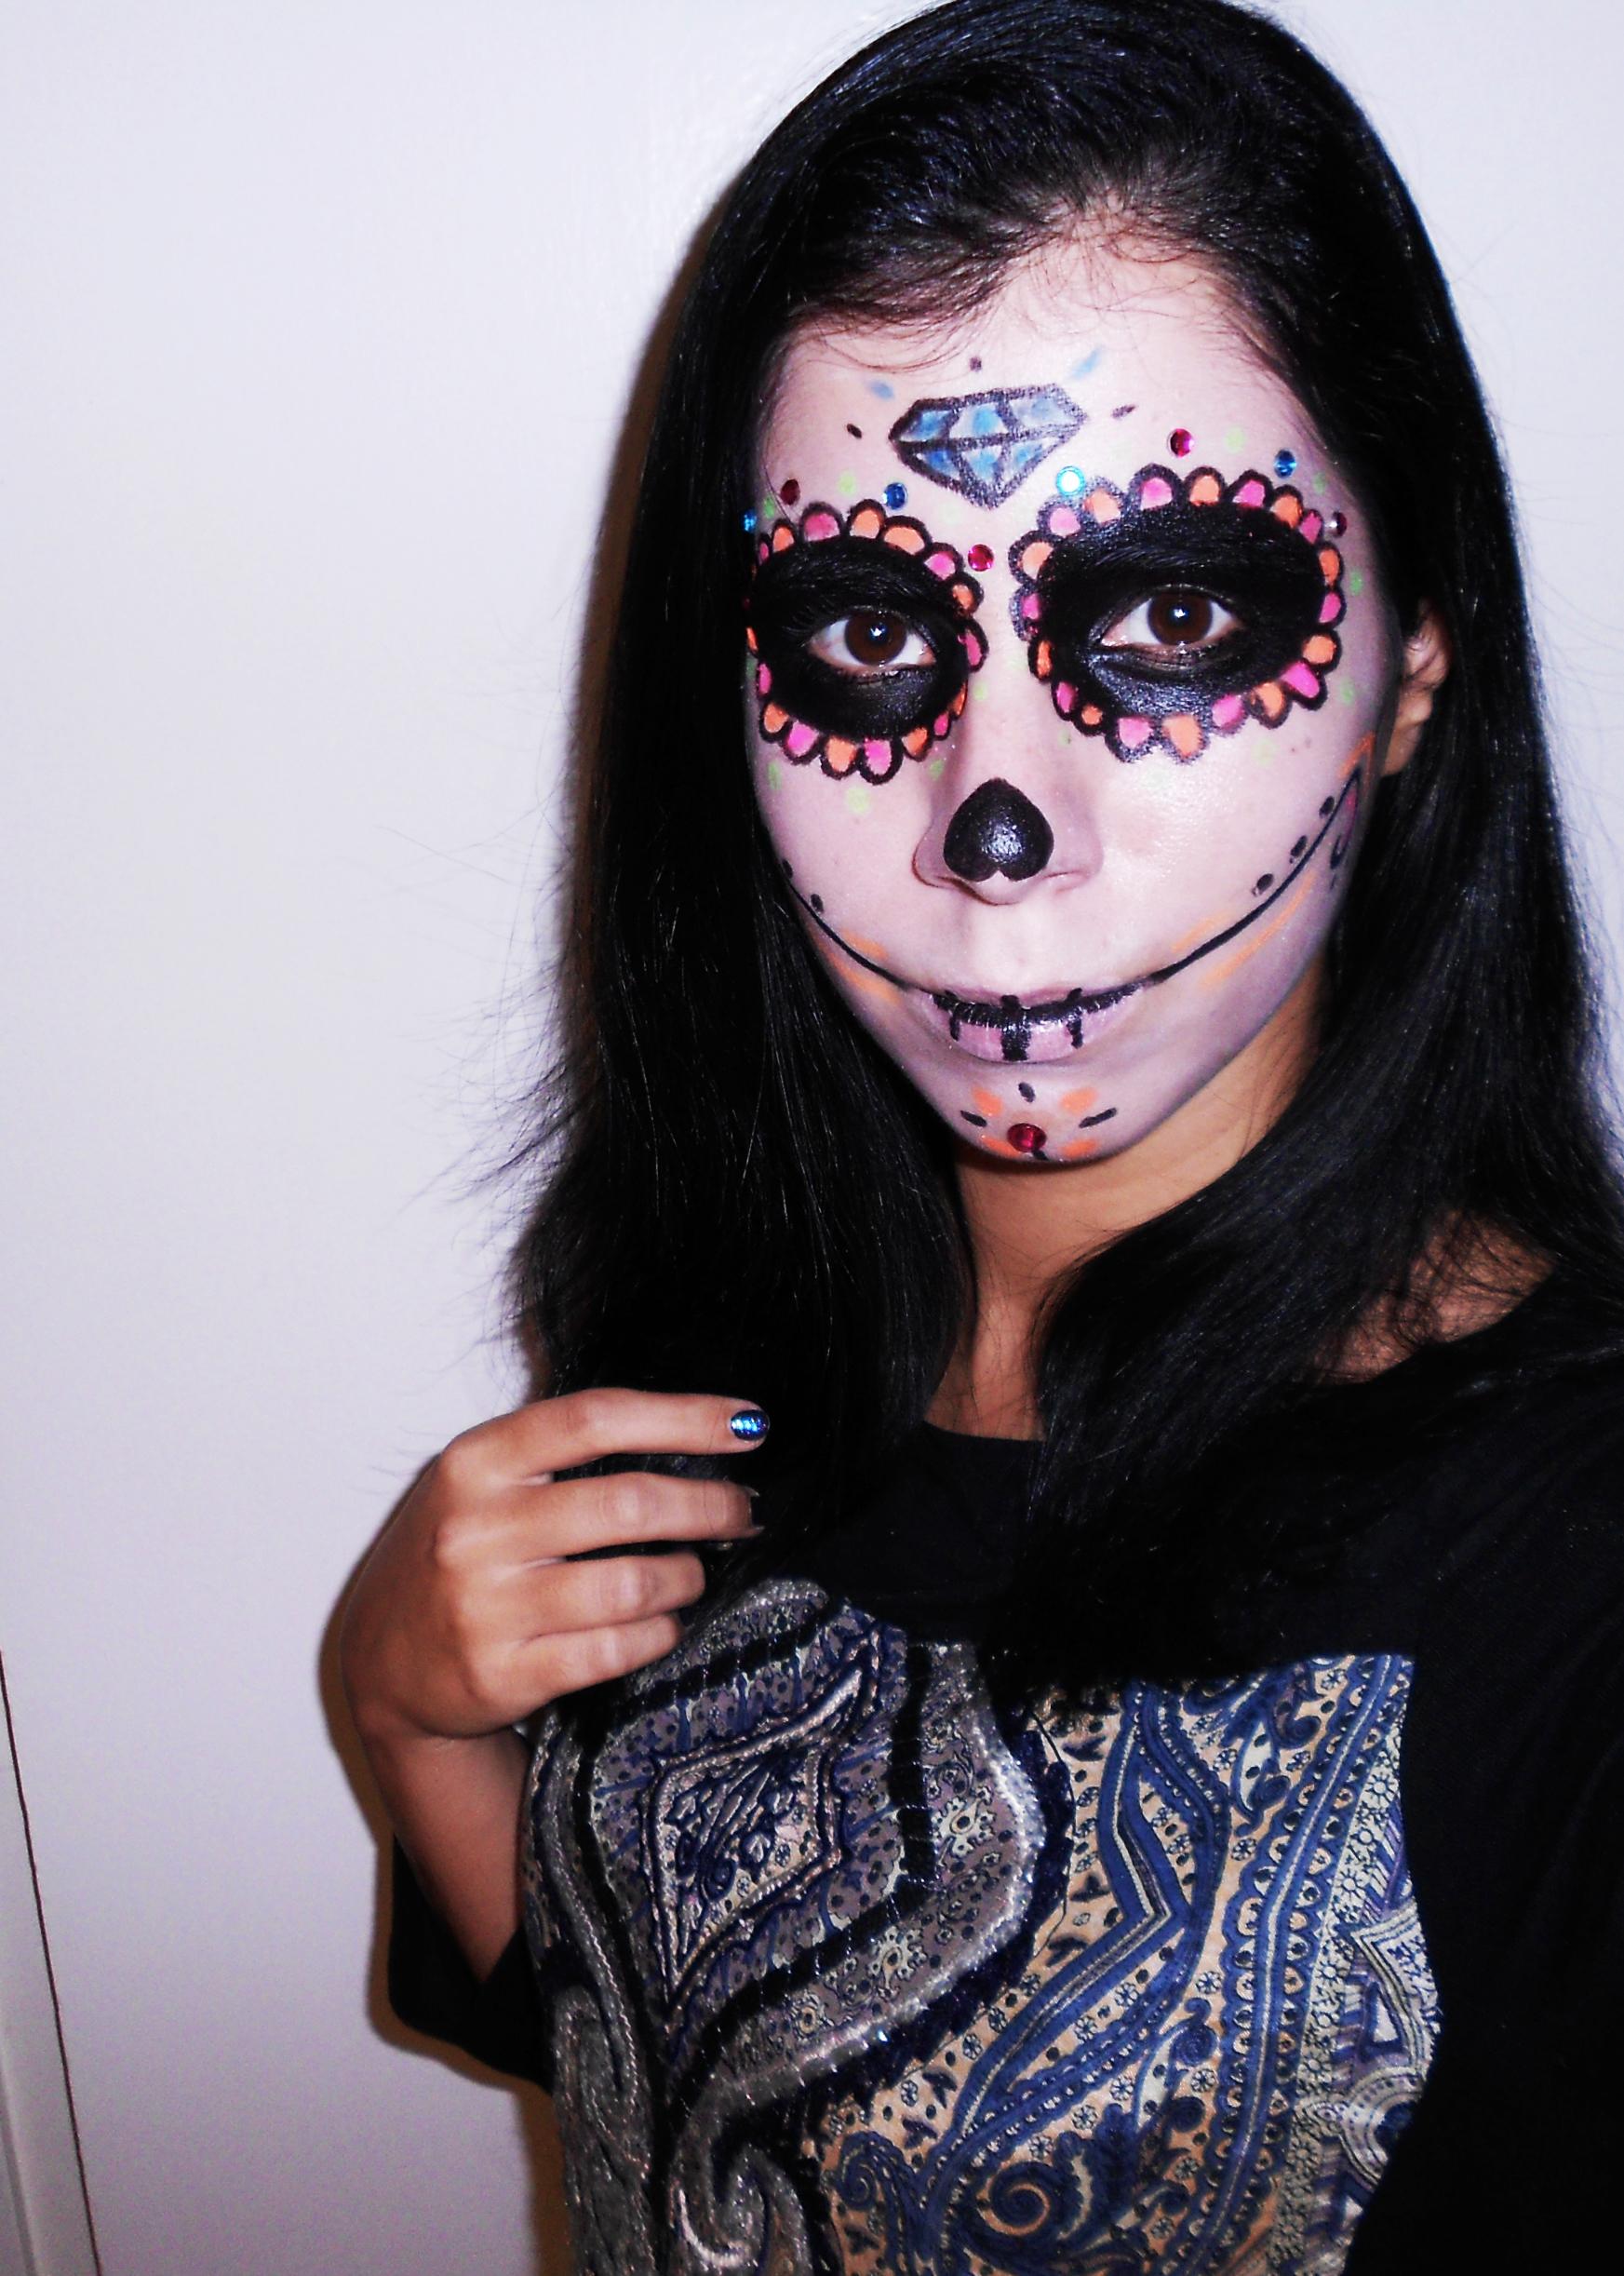 calavera halloween dia de los muertos maquilhagem makeup diy máscara maquiagem tutorial beleza beauty blog dia das bruxas carnaval disfarce pintura